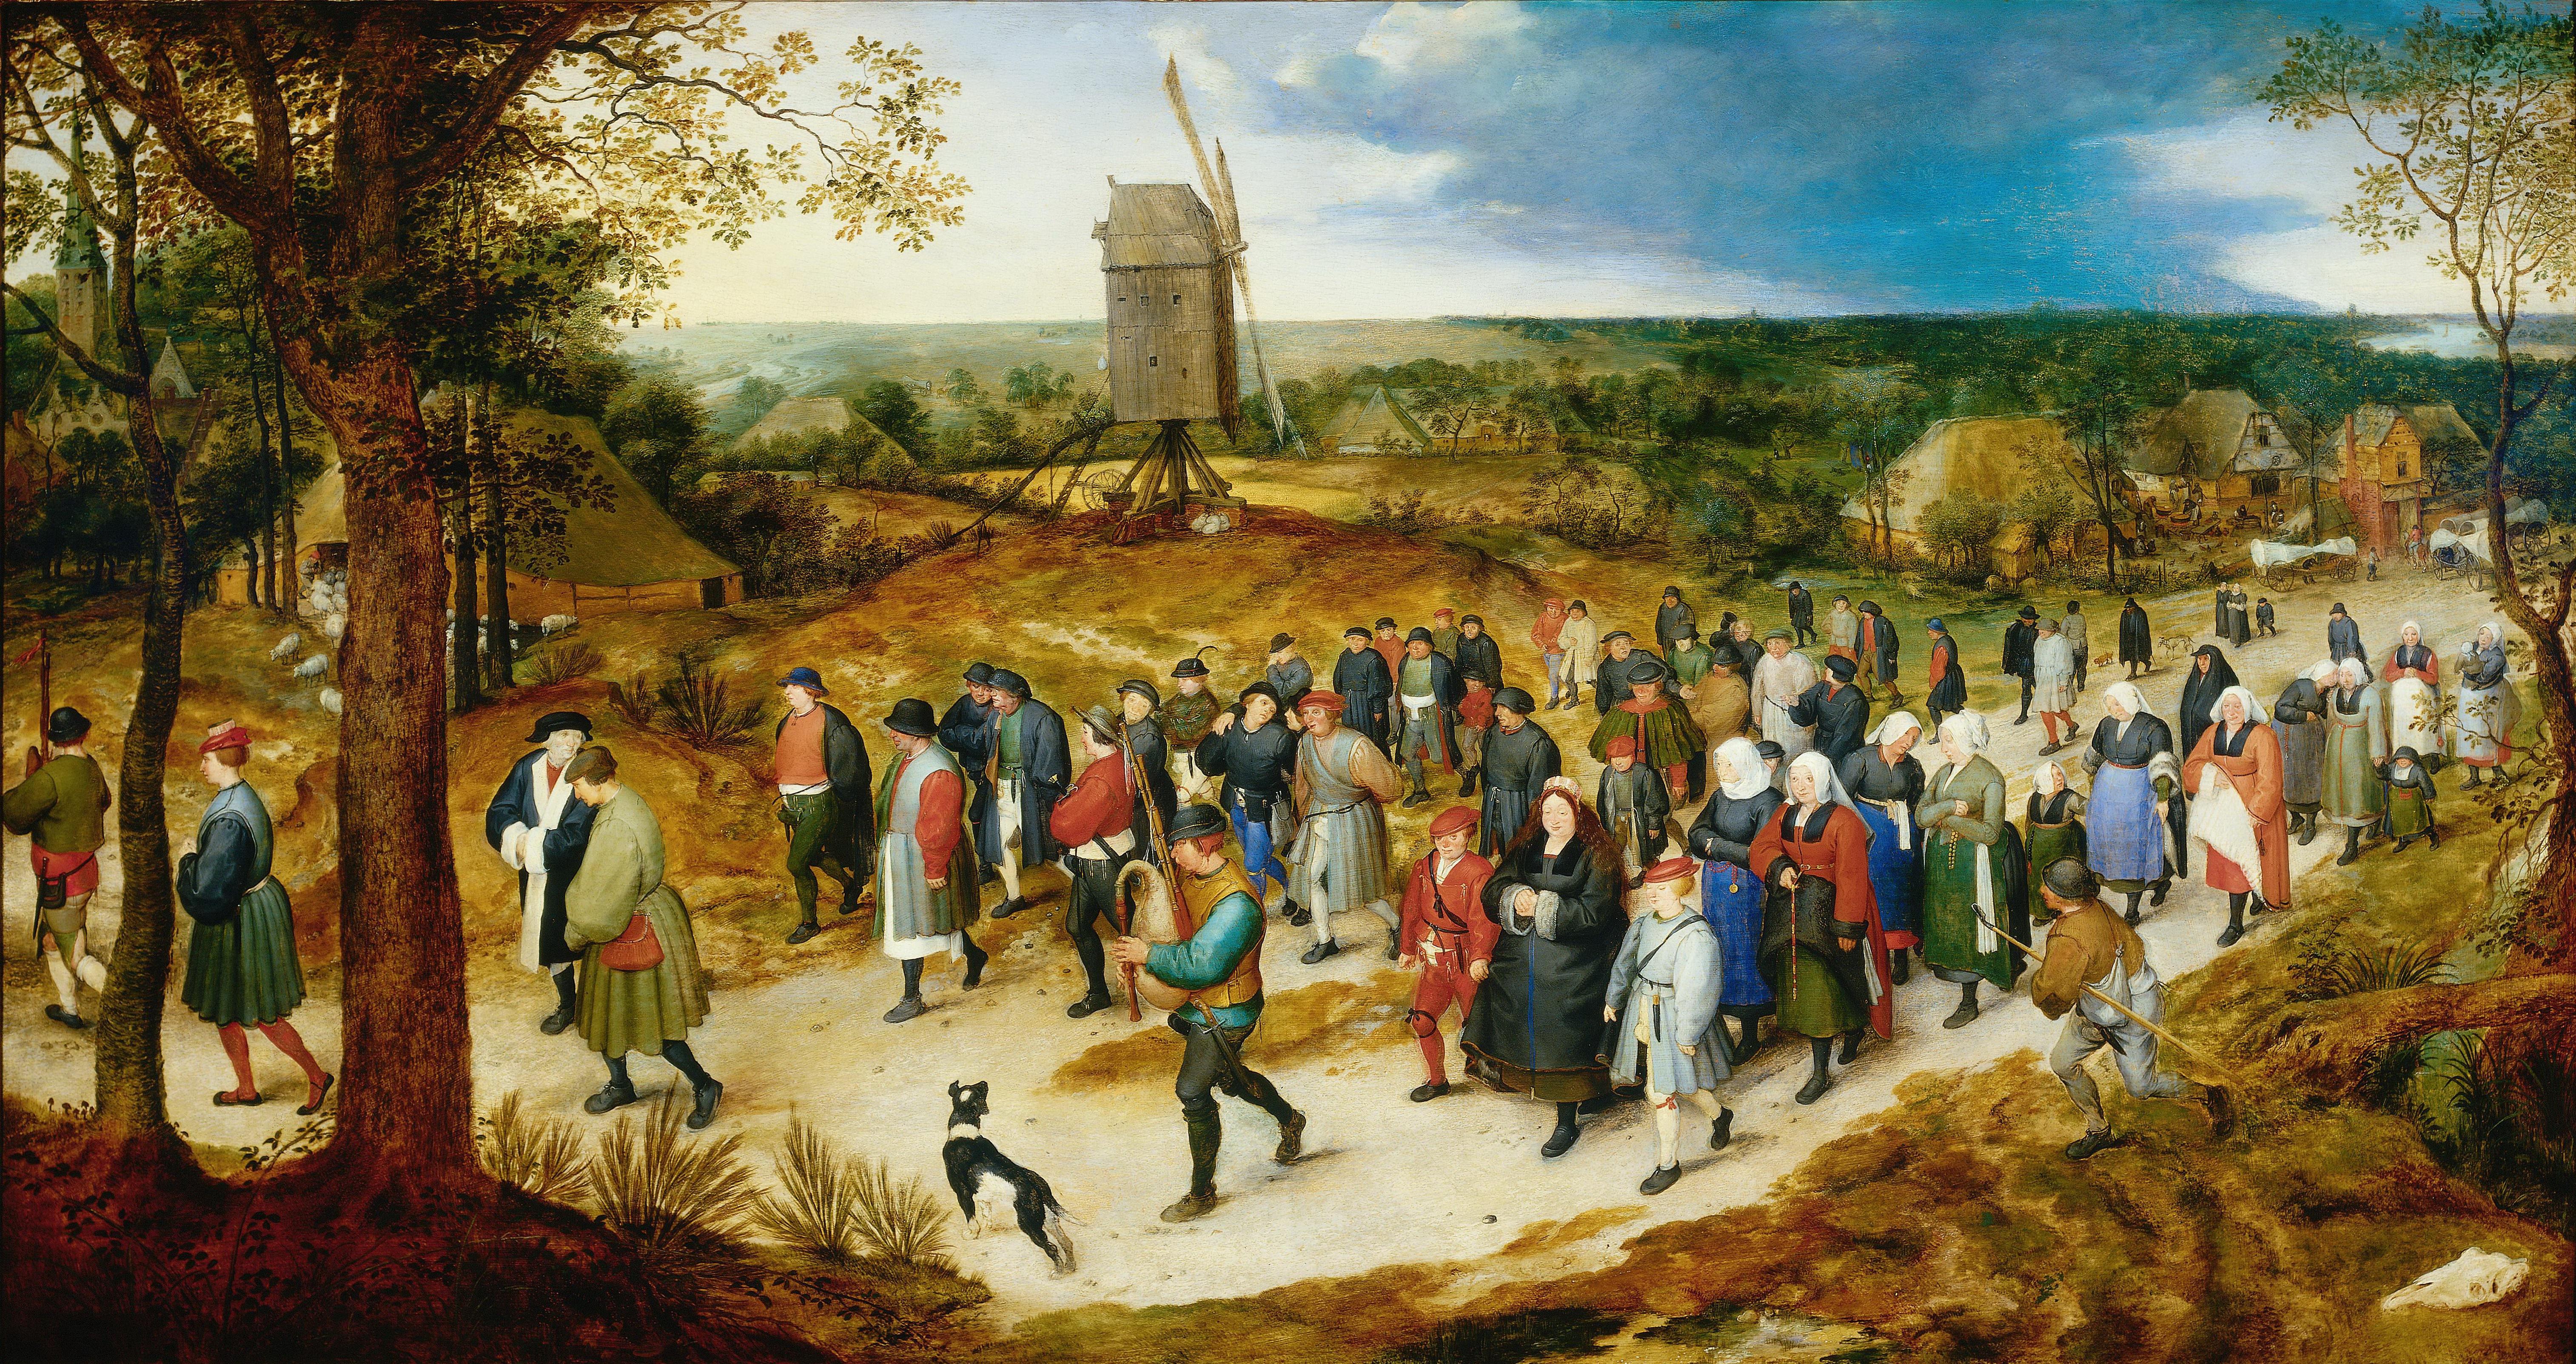 jan-brueghel-lancien-Le-Cortege-des-Noces-Musee-de-la-Ville-de-Bruxelles